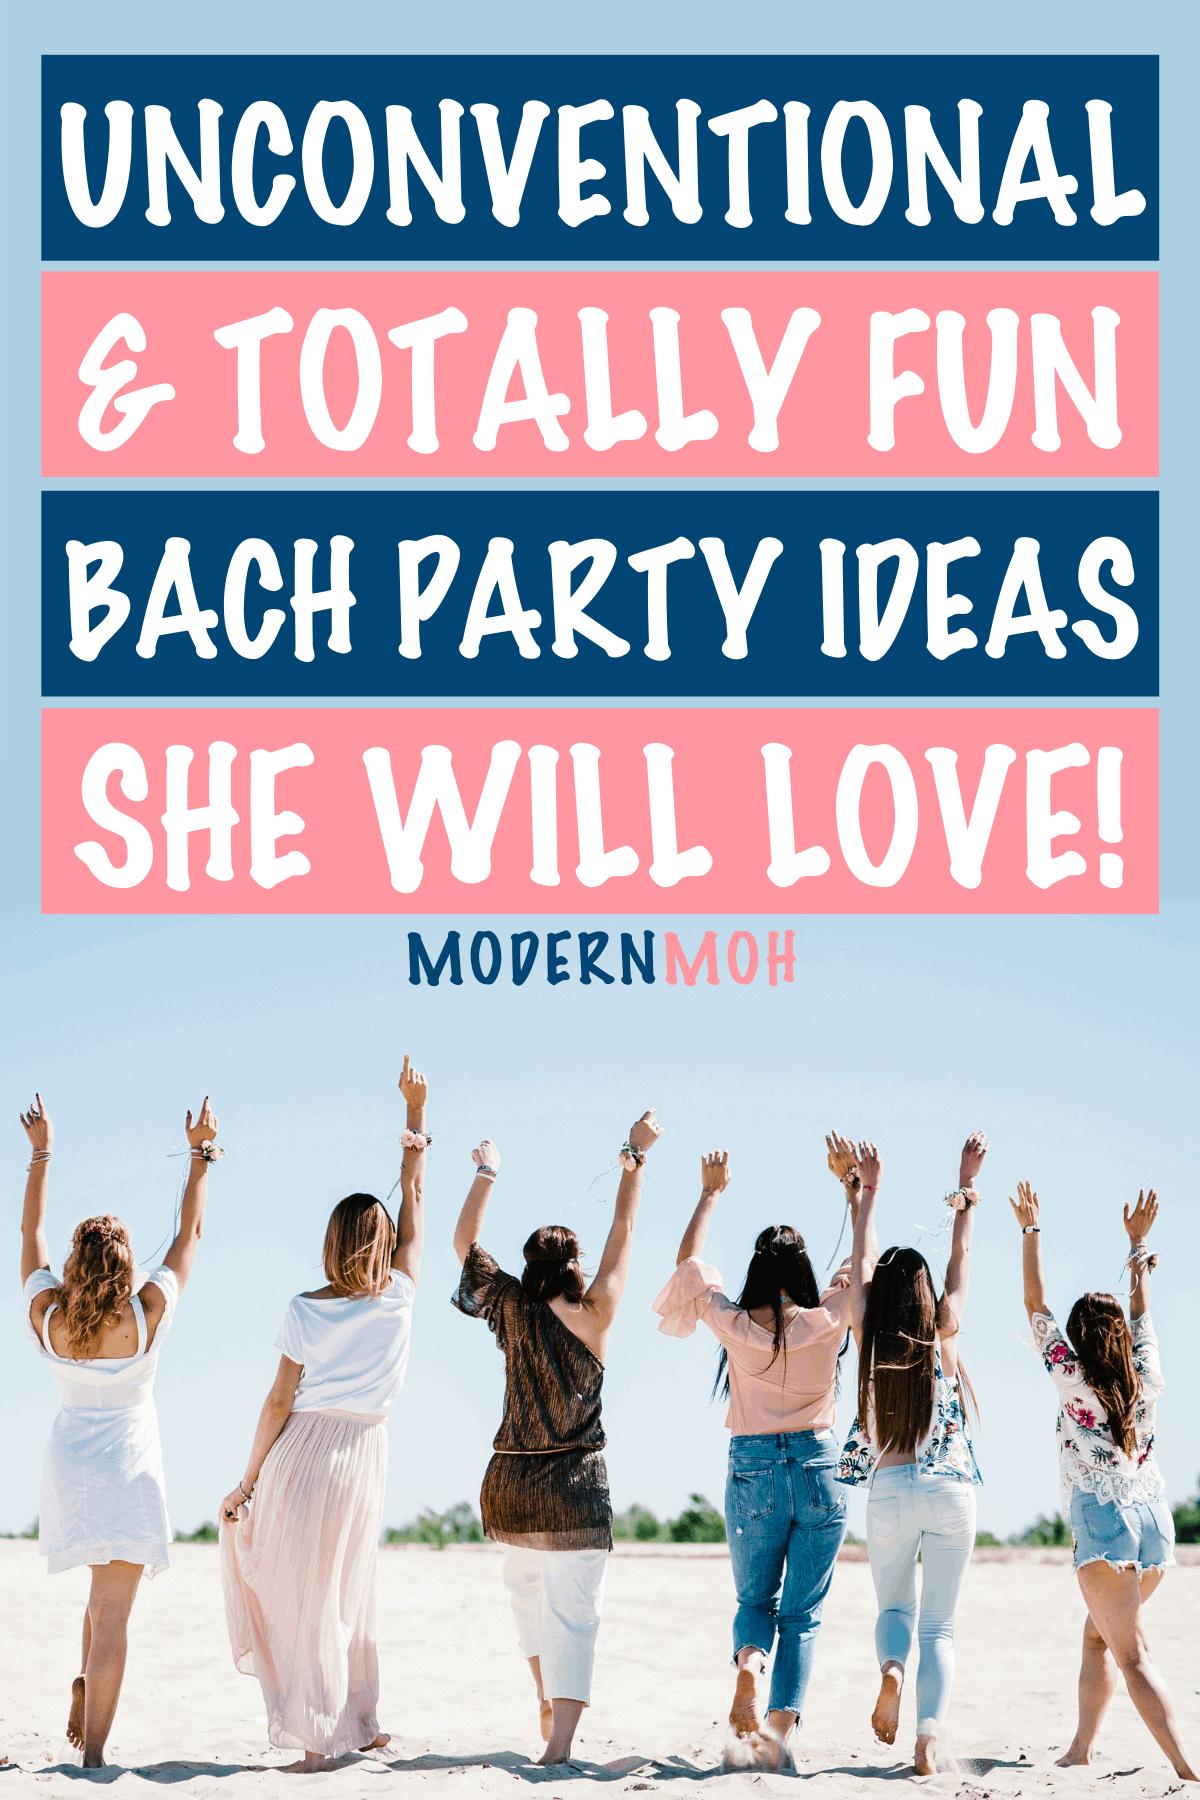 24 Bachelorette Party Ideas for the Unconventional Bride